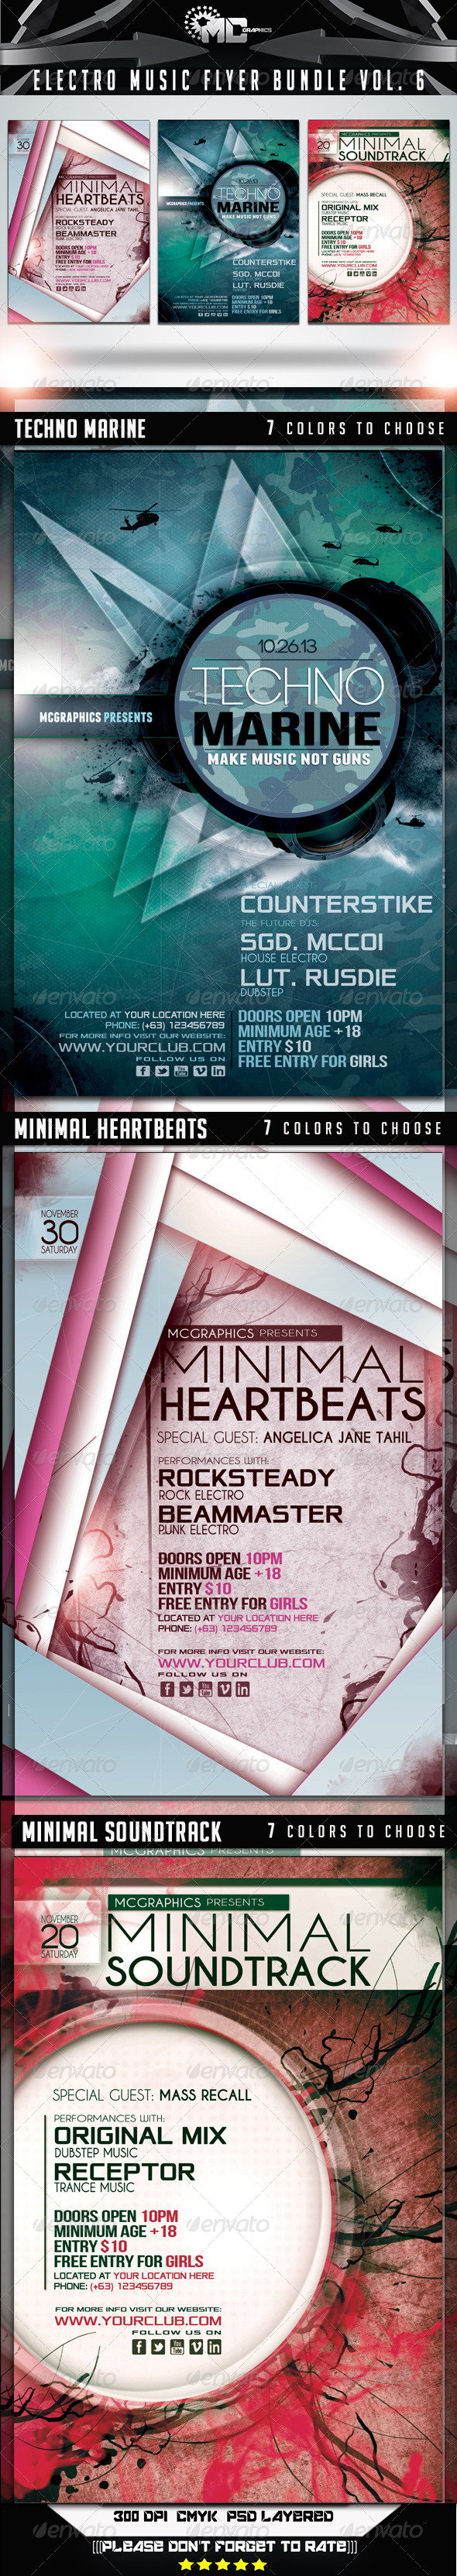 Electro Music Flyer Bundle Vol. 6 - Flyers Print Templates